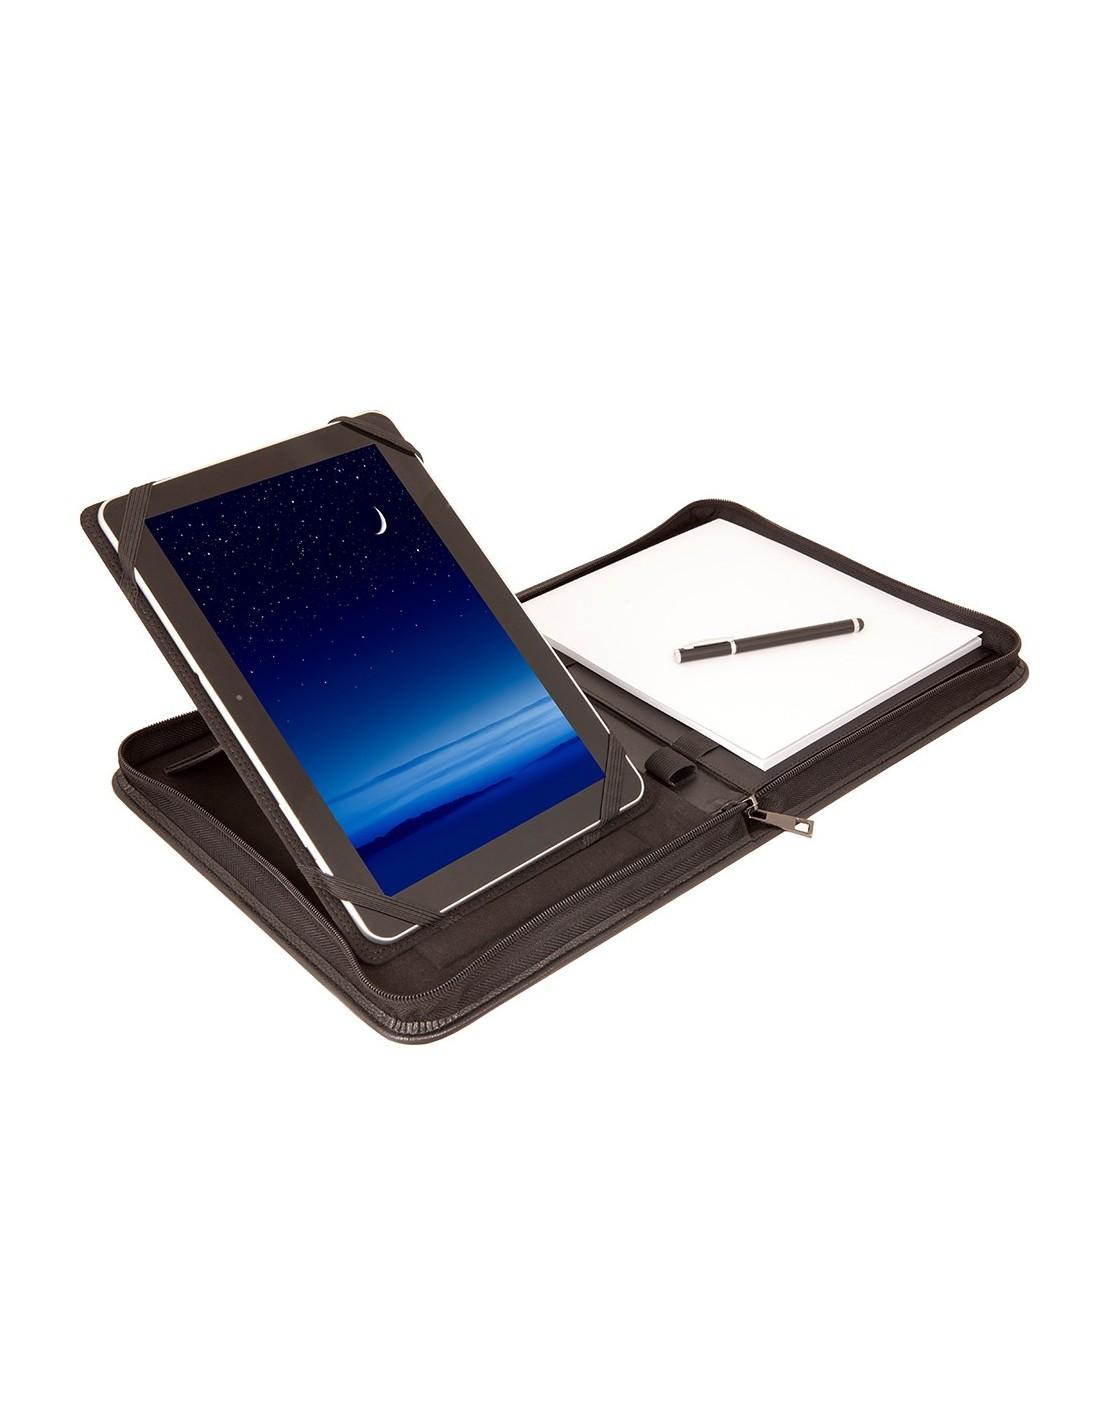 etui professionnel universel tablettes tactiles 10 39 39 urban factory. Black Bedroom Furniture Sets. Home Design Ideas